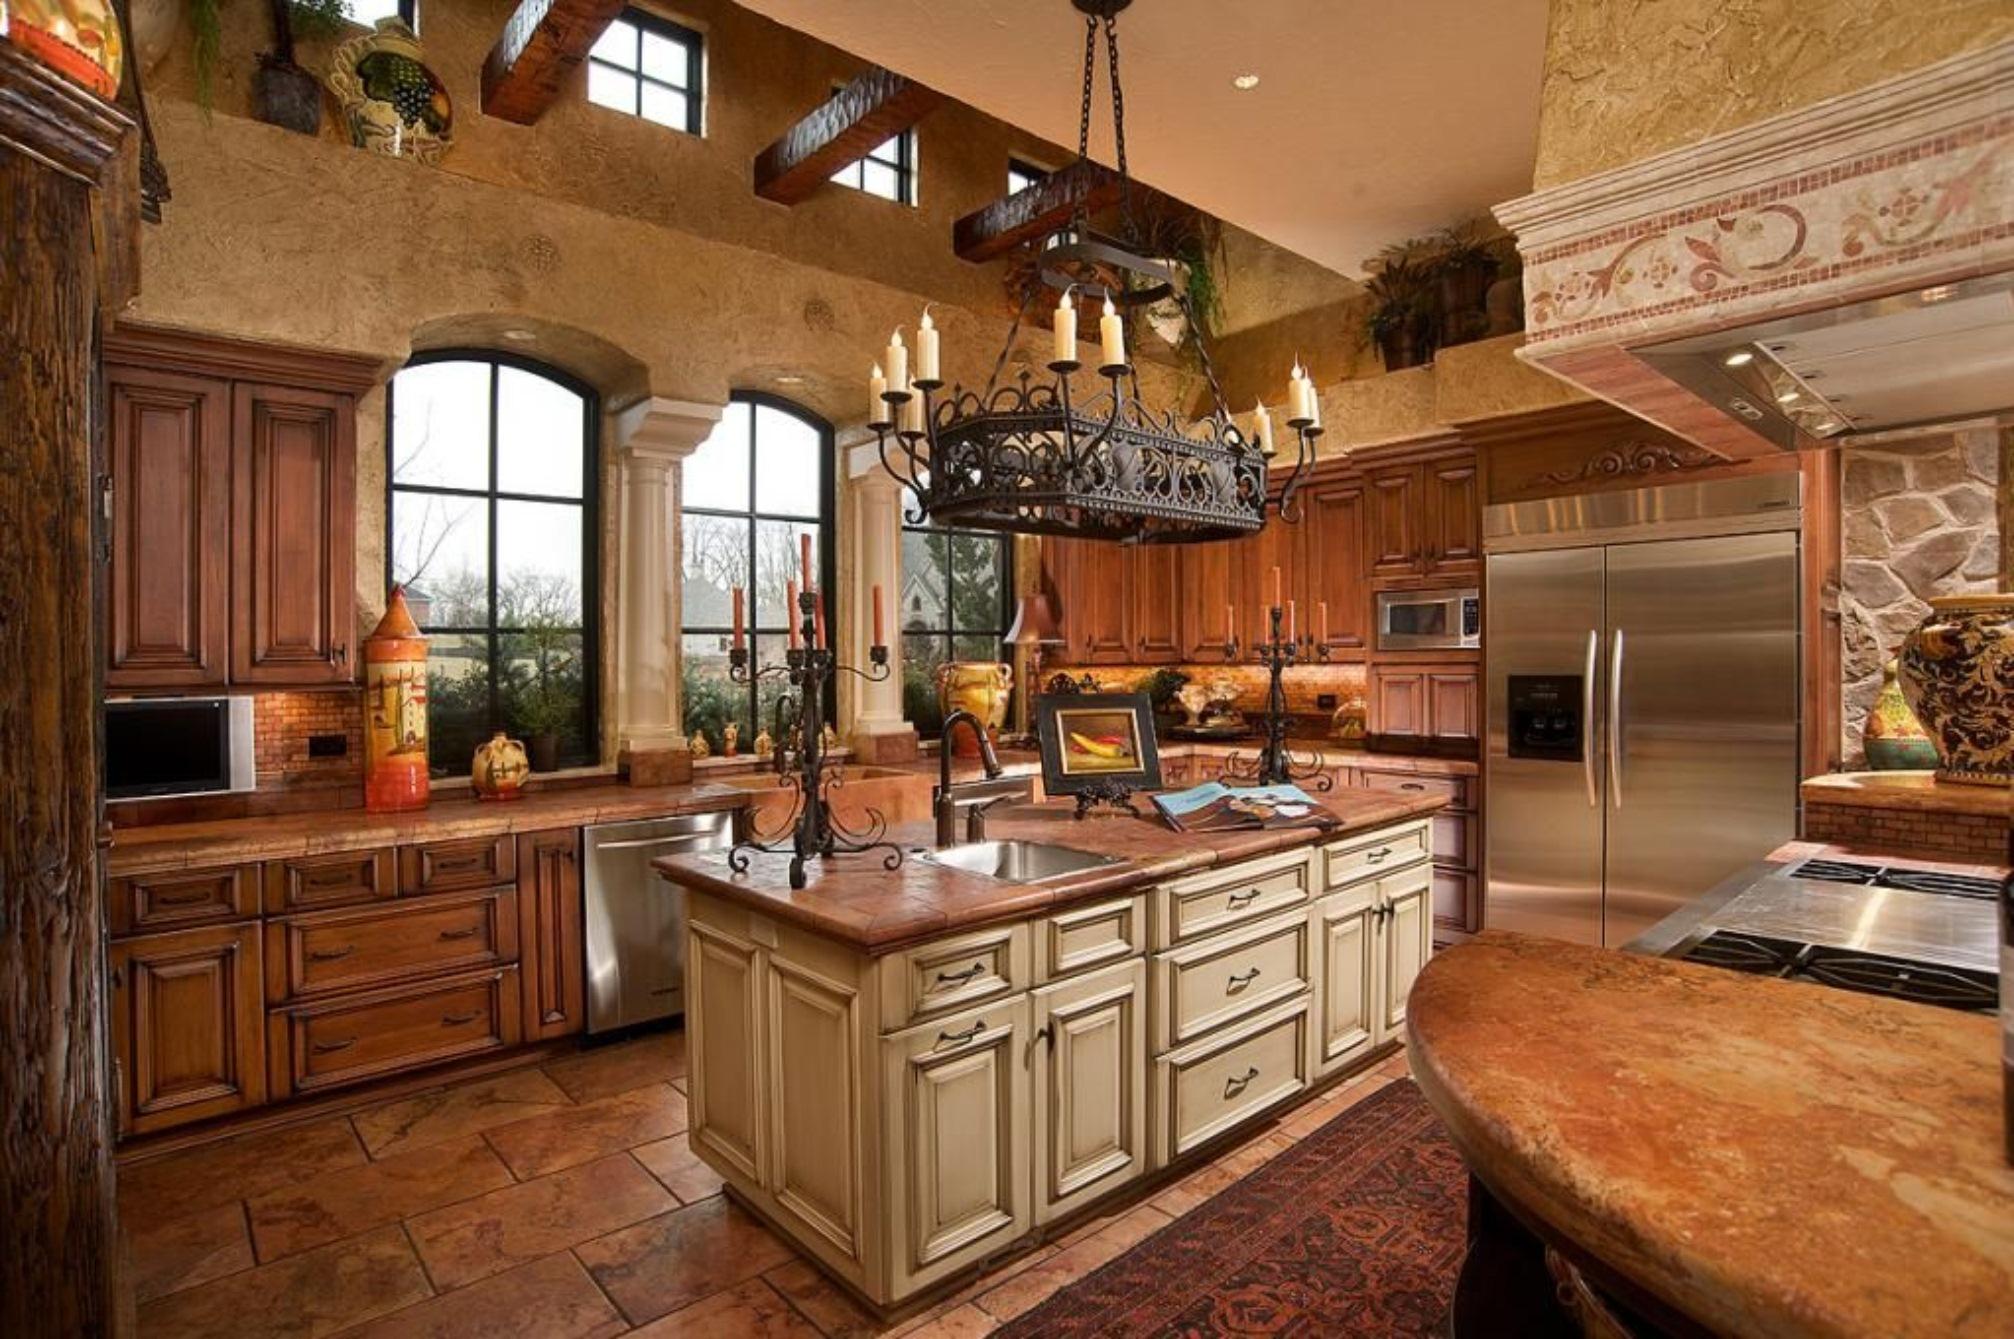 country-tarzi-mutfak-dekorasyon-modeli-12 Country Tarzı Mutfak Dekorasyonu